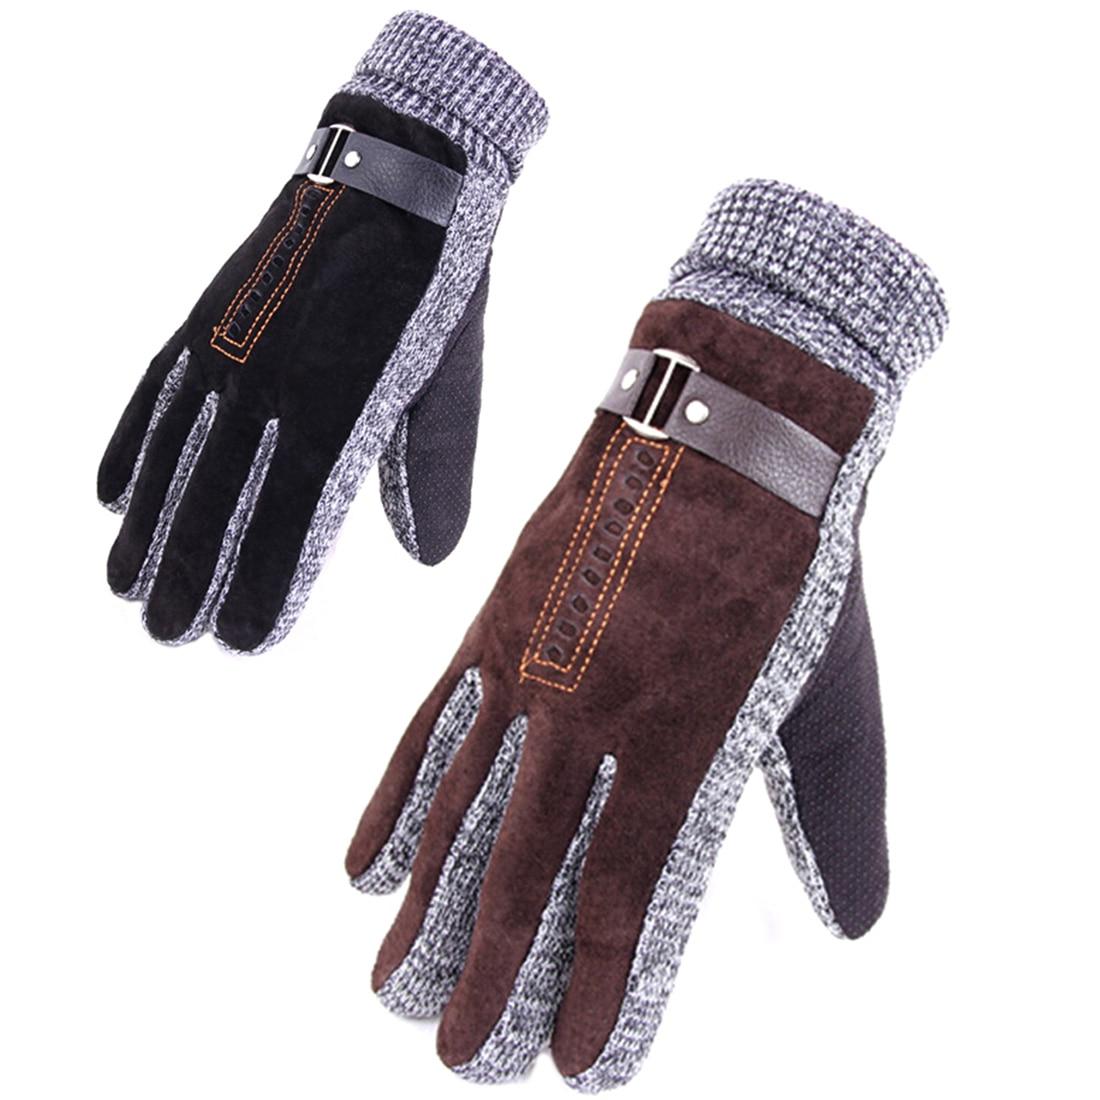 Mens gloves fashion - Pigskin Gloves High Quality Winter Thicken Fleece Warm Men S Leather Gloves For Men Mittens Long Gloves Male Leather Gloves 0062 In Gloves Mittens From